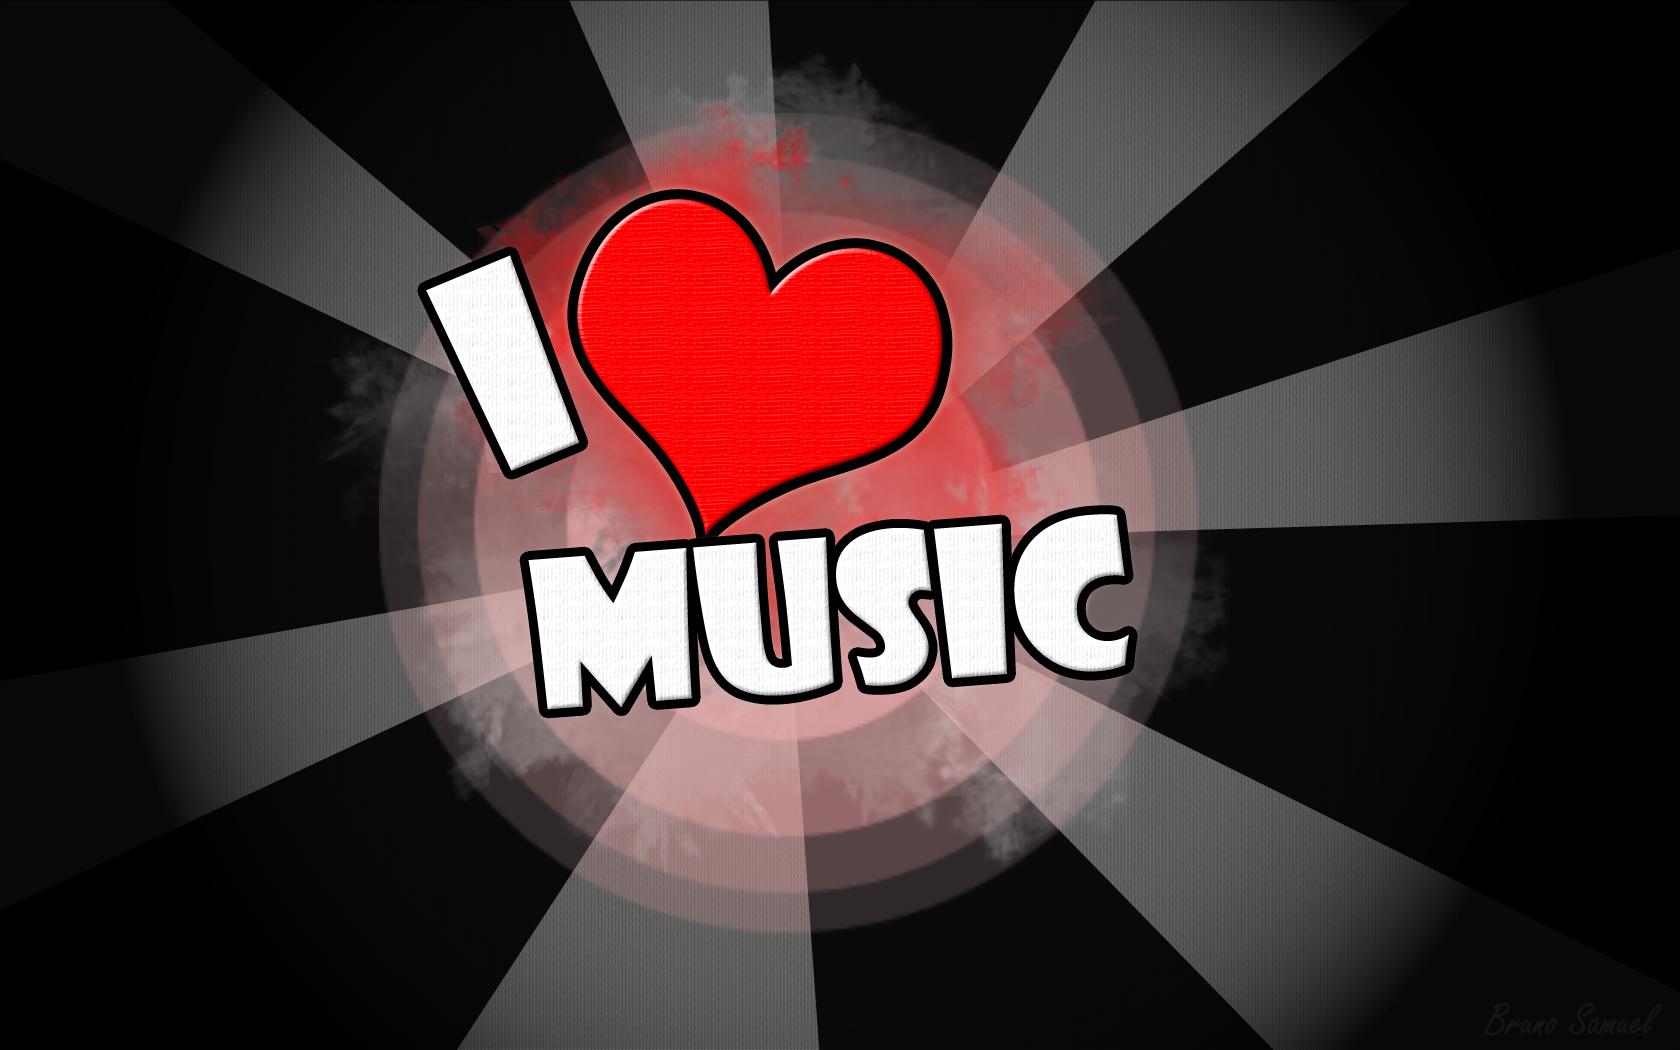 love-music-wallpaper-by-brunosamuel